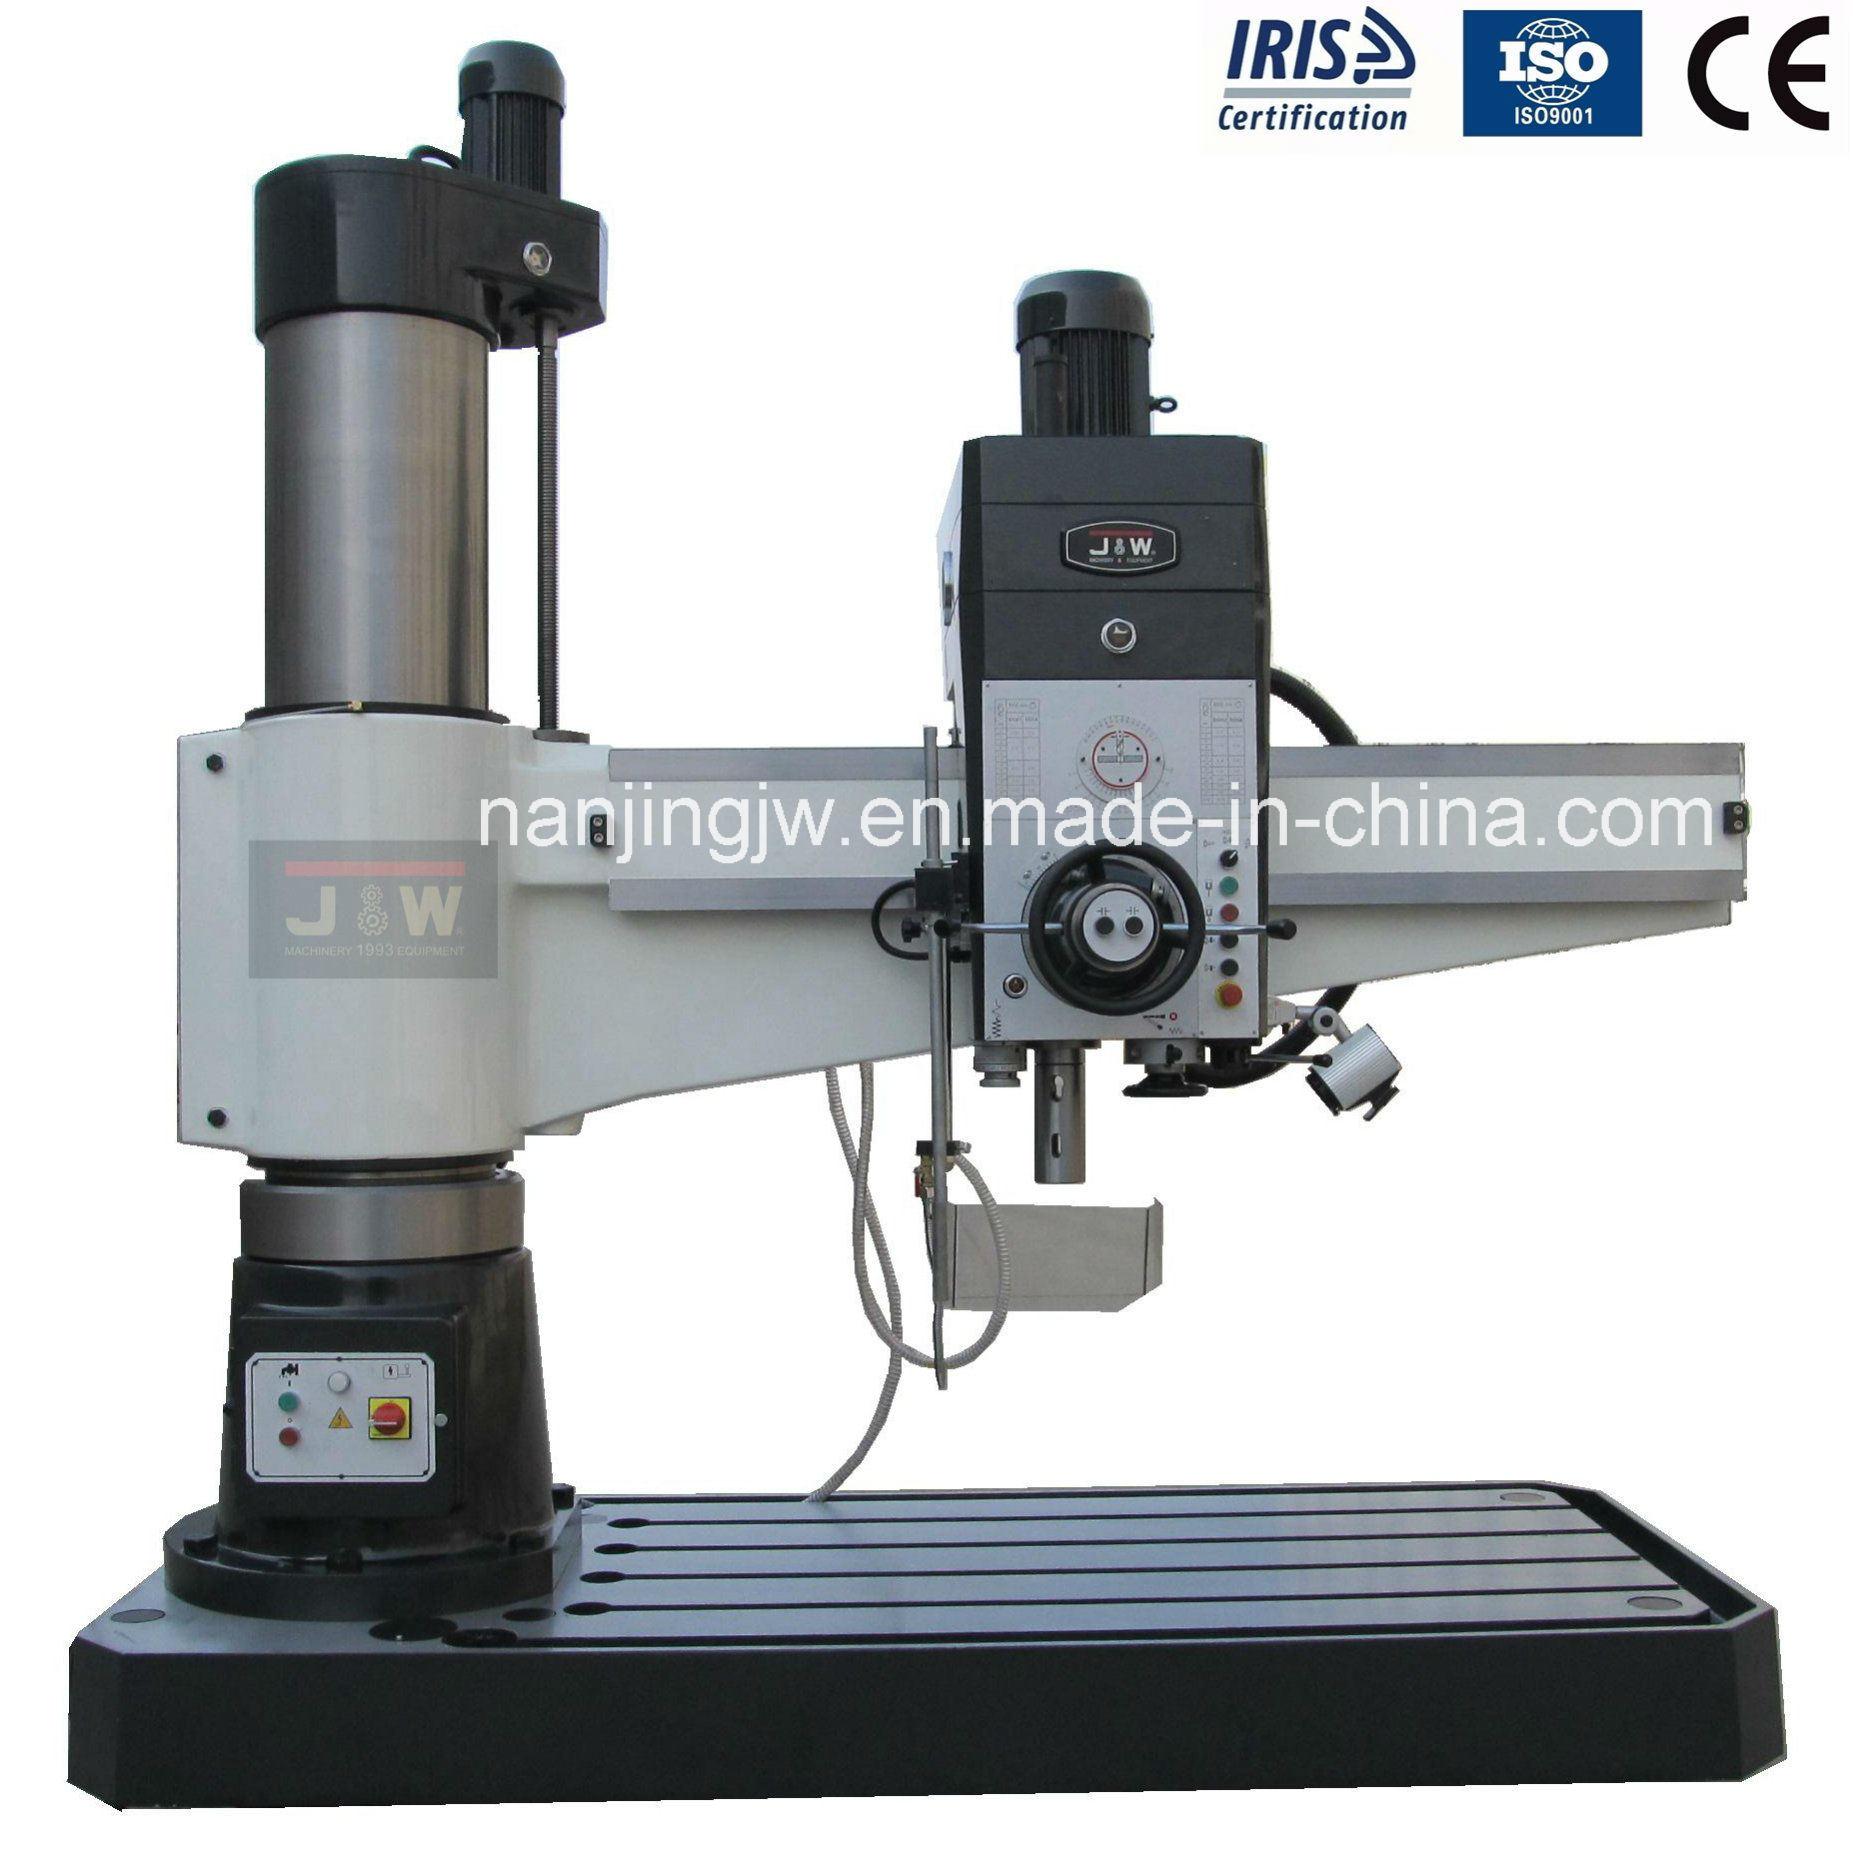 [Hot Item] (CNC) Hydraulic Radial Drilling Machine Vertical Driller  (Z3050/Z3063/Z3080/Z30100/Z30125)